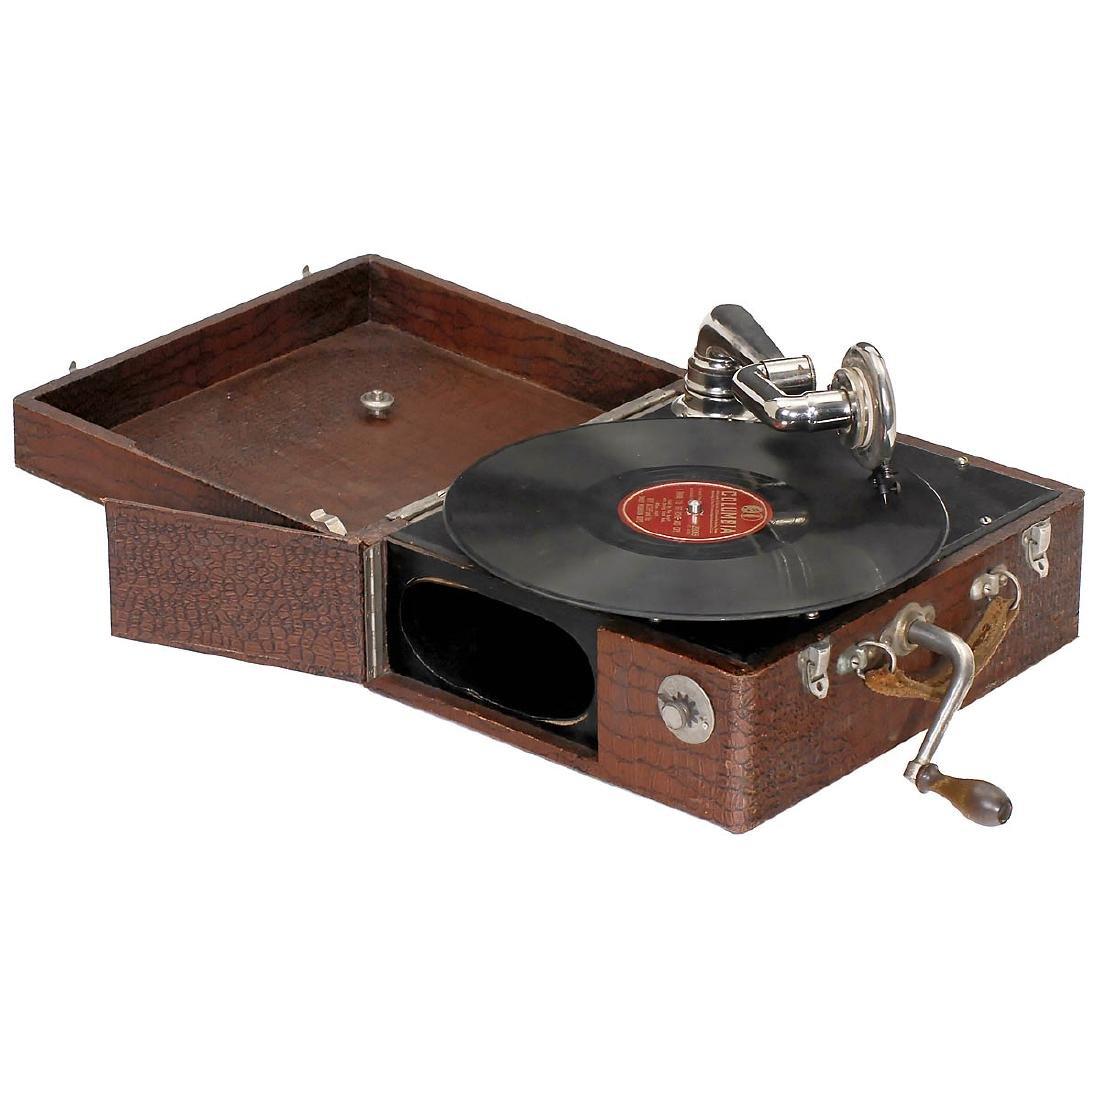 Limania Gramophone, c. 1930